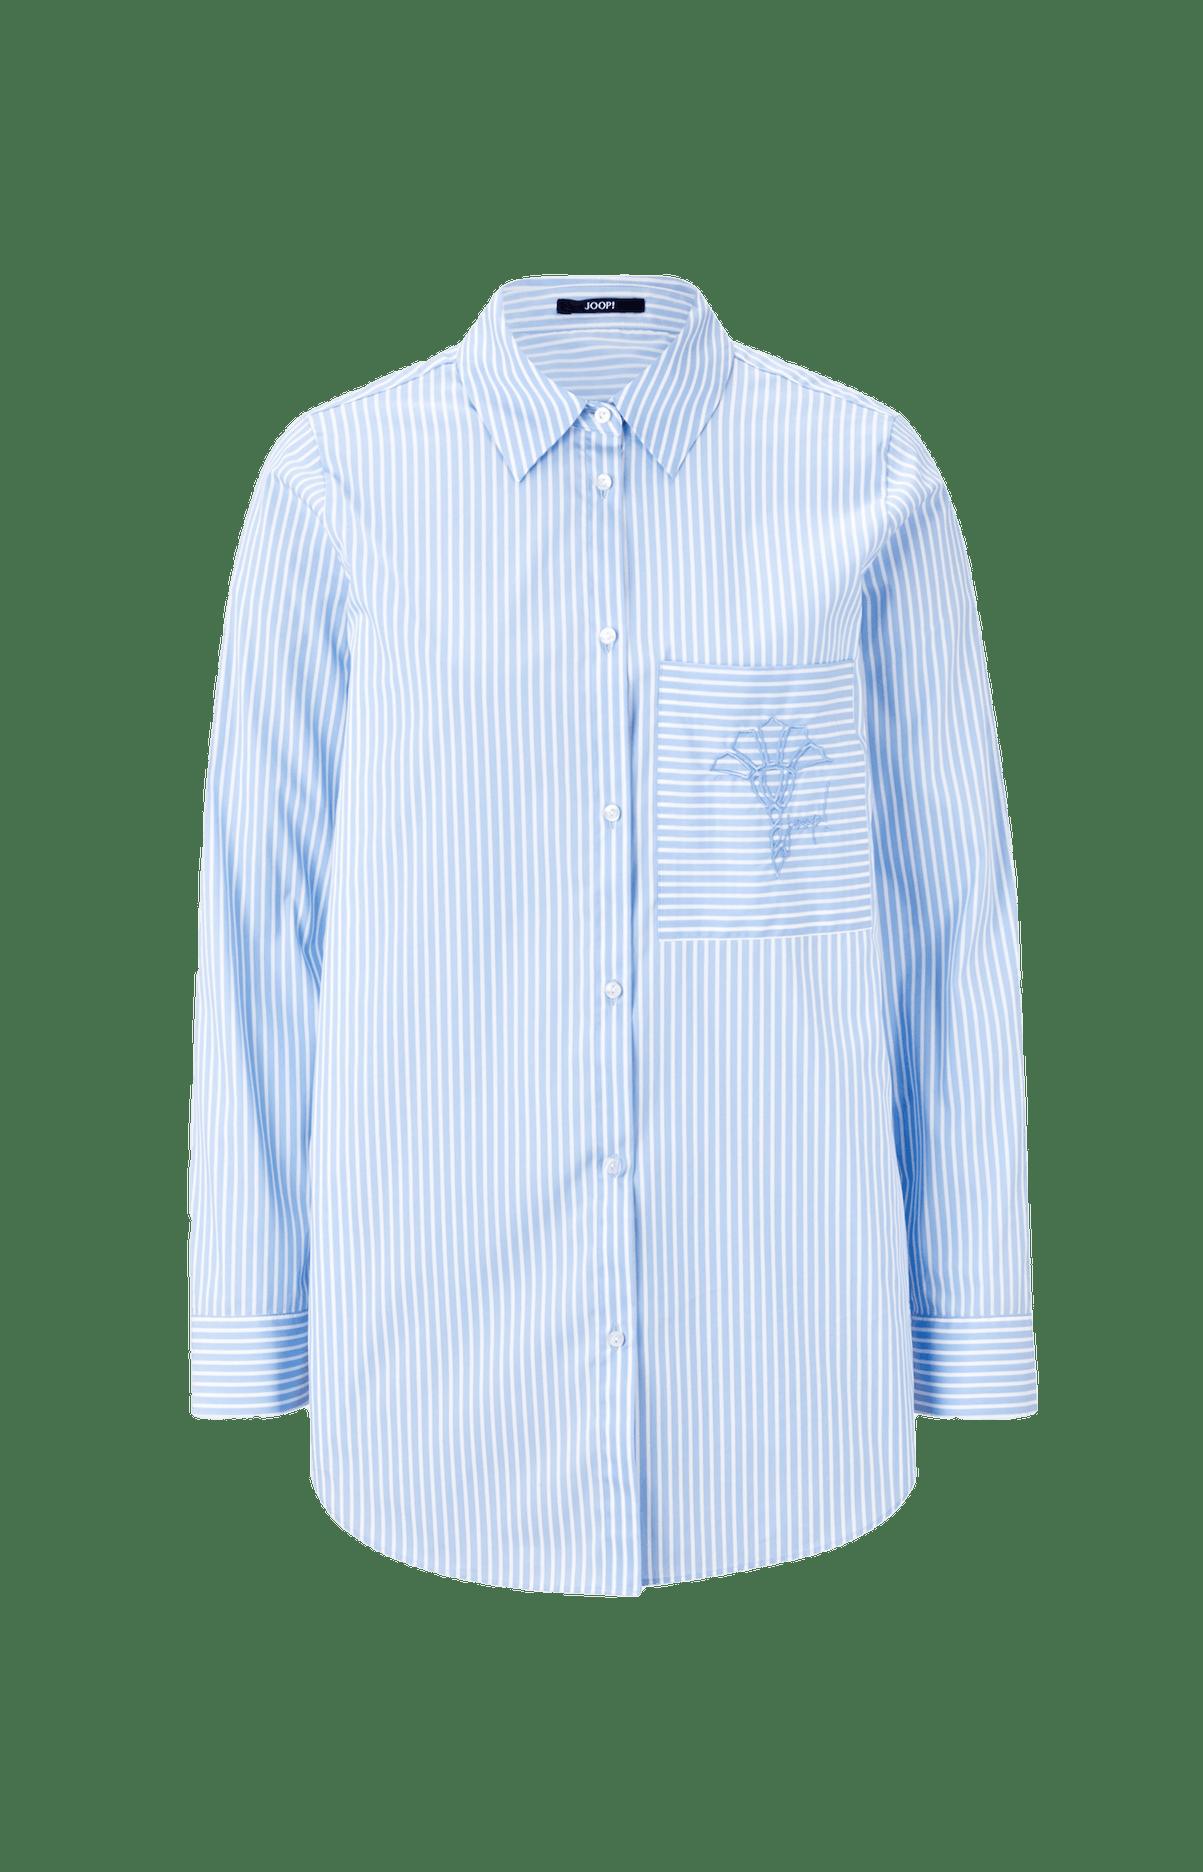 Bluse Bine in Hellblau/Weiß gestreift